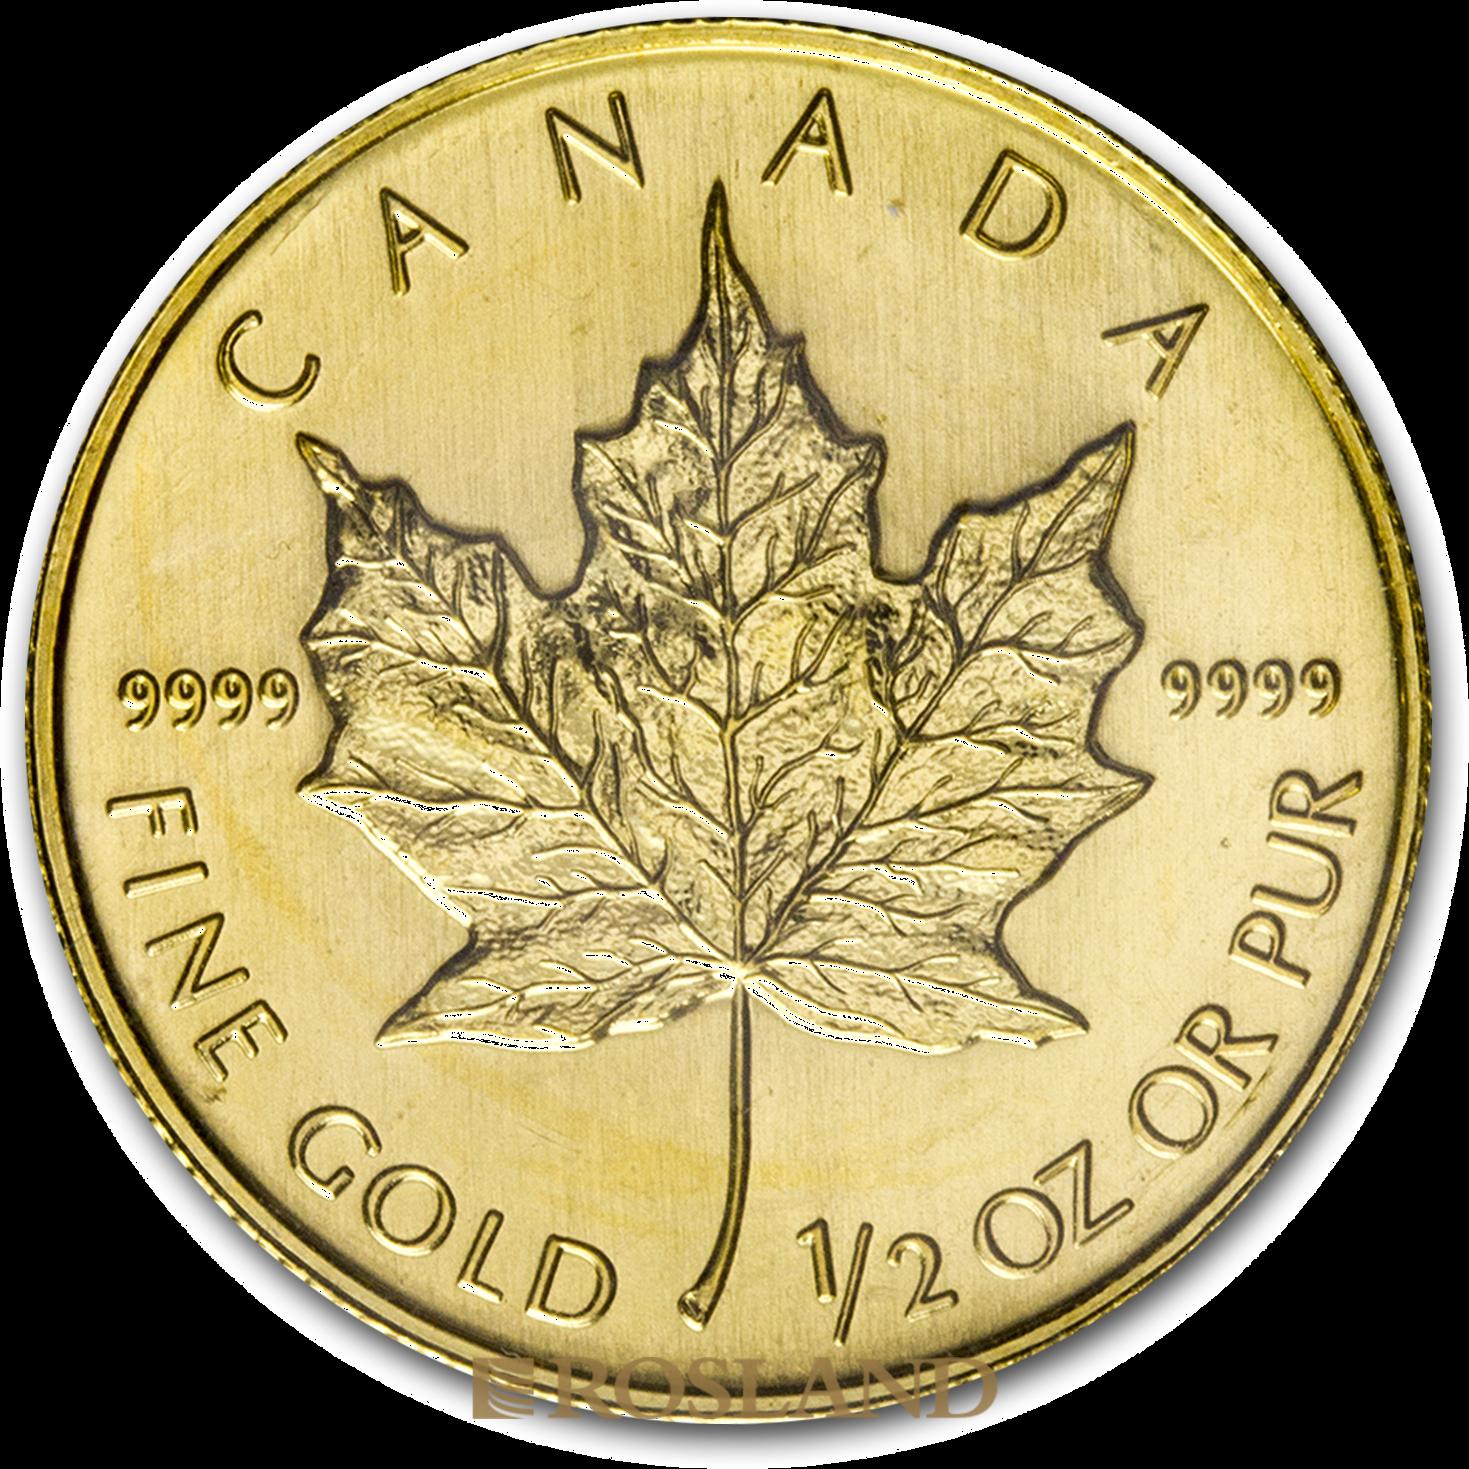 1/2 Unze Goldmünze Kanada Maple Leaf 2008